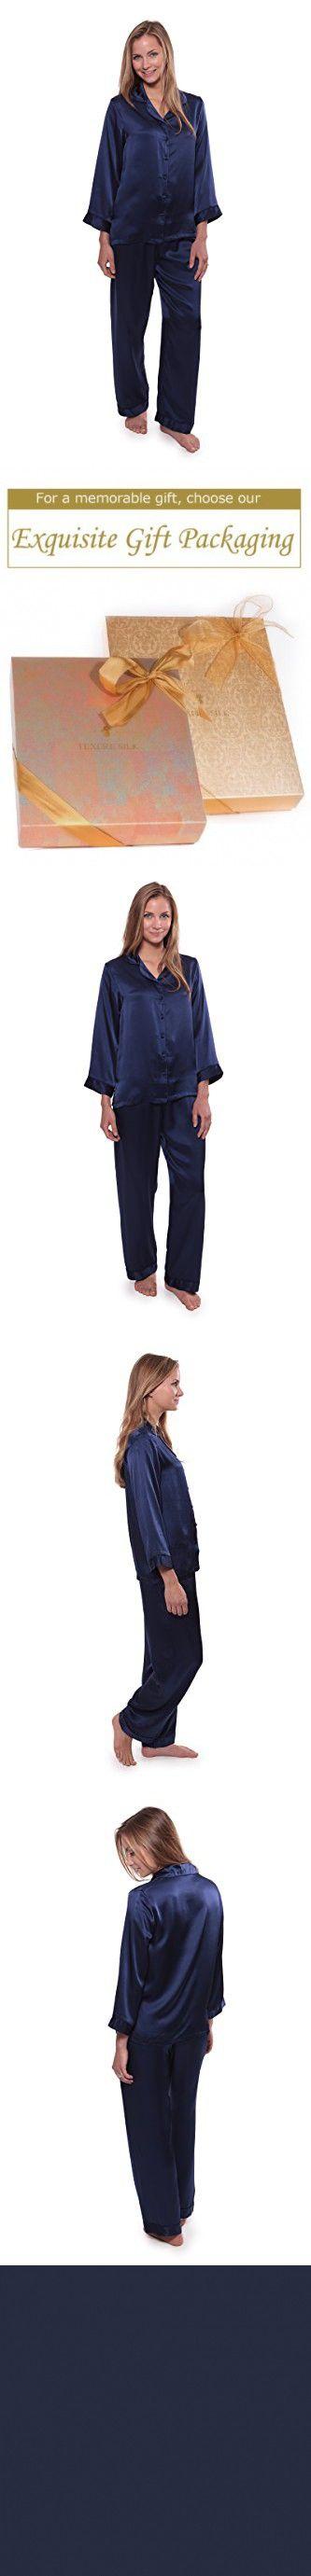 TexereSilk Women's Luxury Silk Pajama Set (Morning Dew, Gulf Blue, Medium/Petite) Cool Gifts for Bridal Shower WS0001-GFB-MP